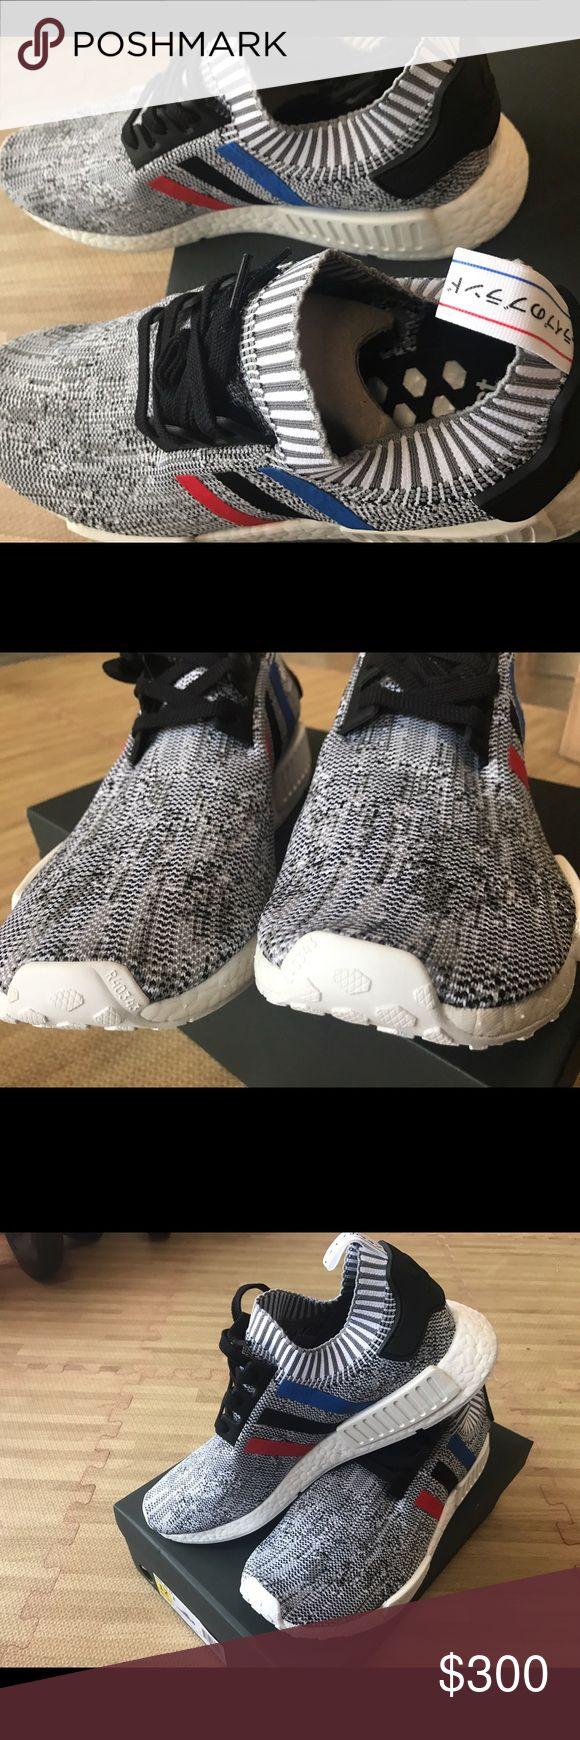 Selling this ADIDAS NMD R1 primeknit tricolor NIB size 12 mens on Poshmark! My username is: whalesand. #shopmycloset #poshmark #fashion #shopping #style #forsale #Adidas #Shoes